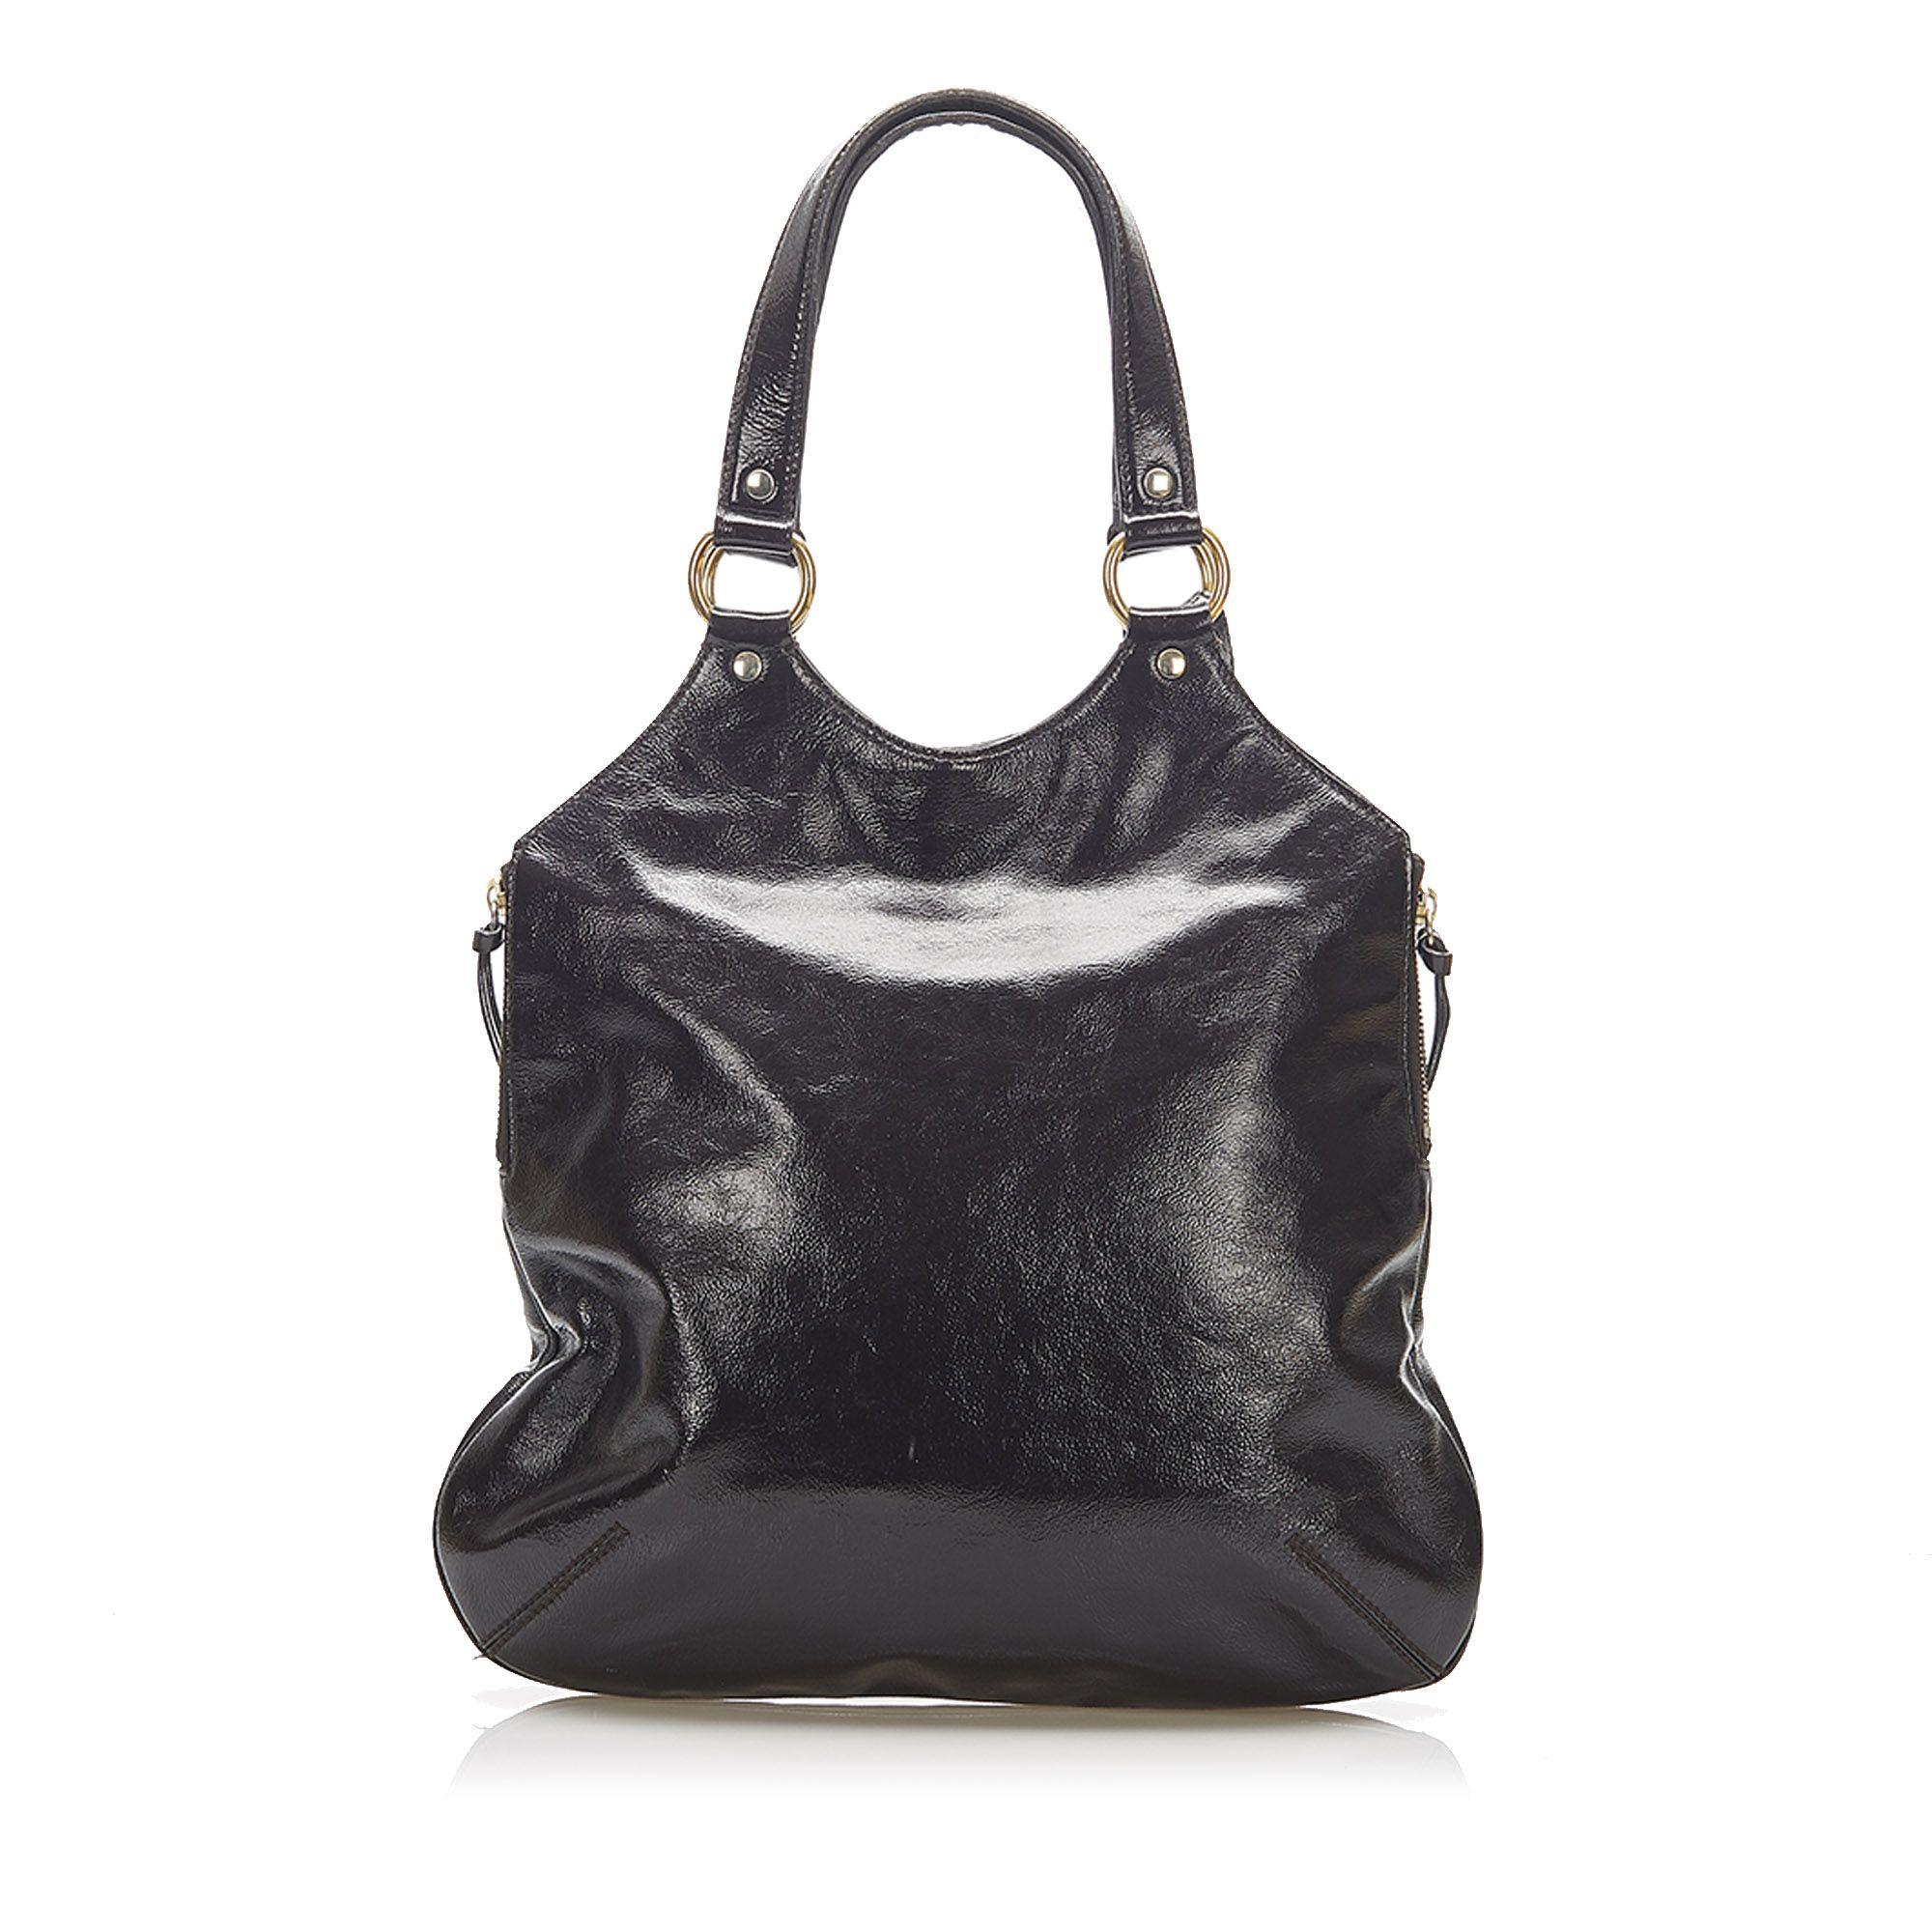 Vintage YSL Sac Metropolis Patent Leather Tote Bag Brown